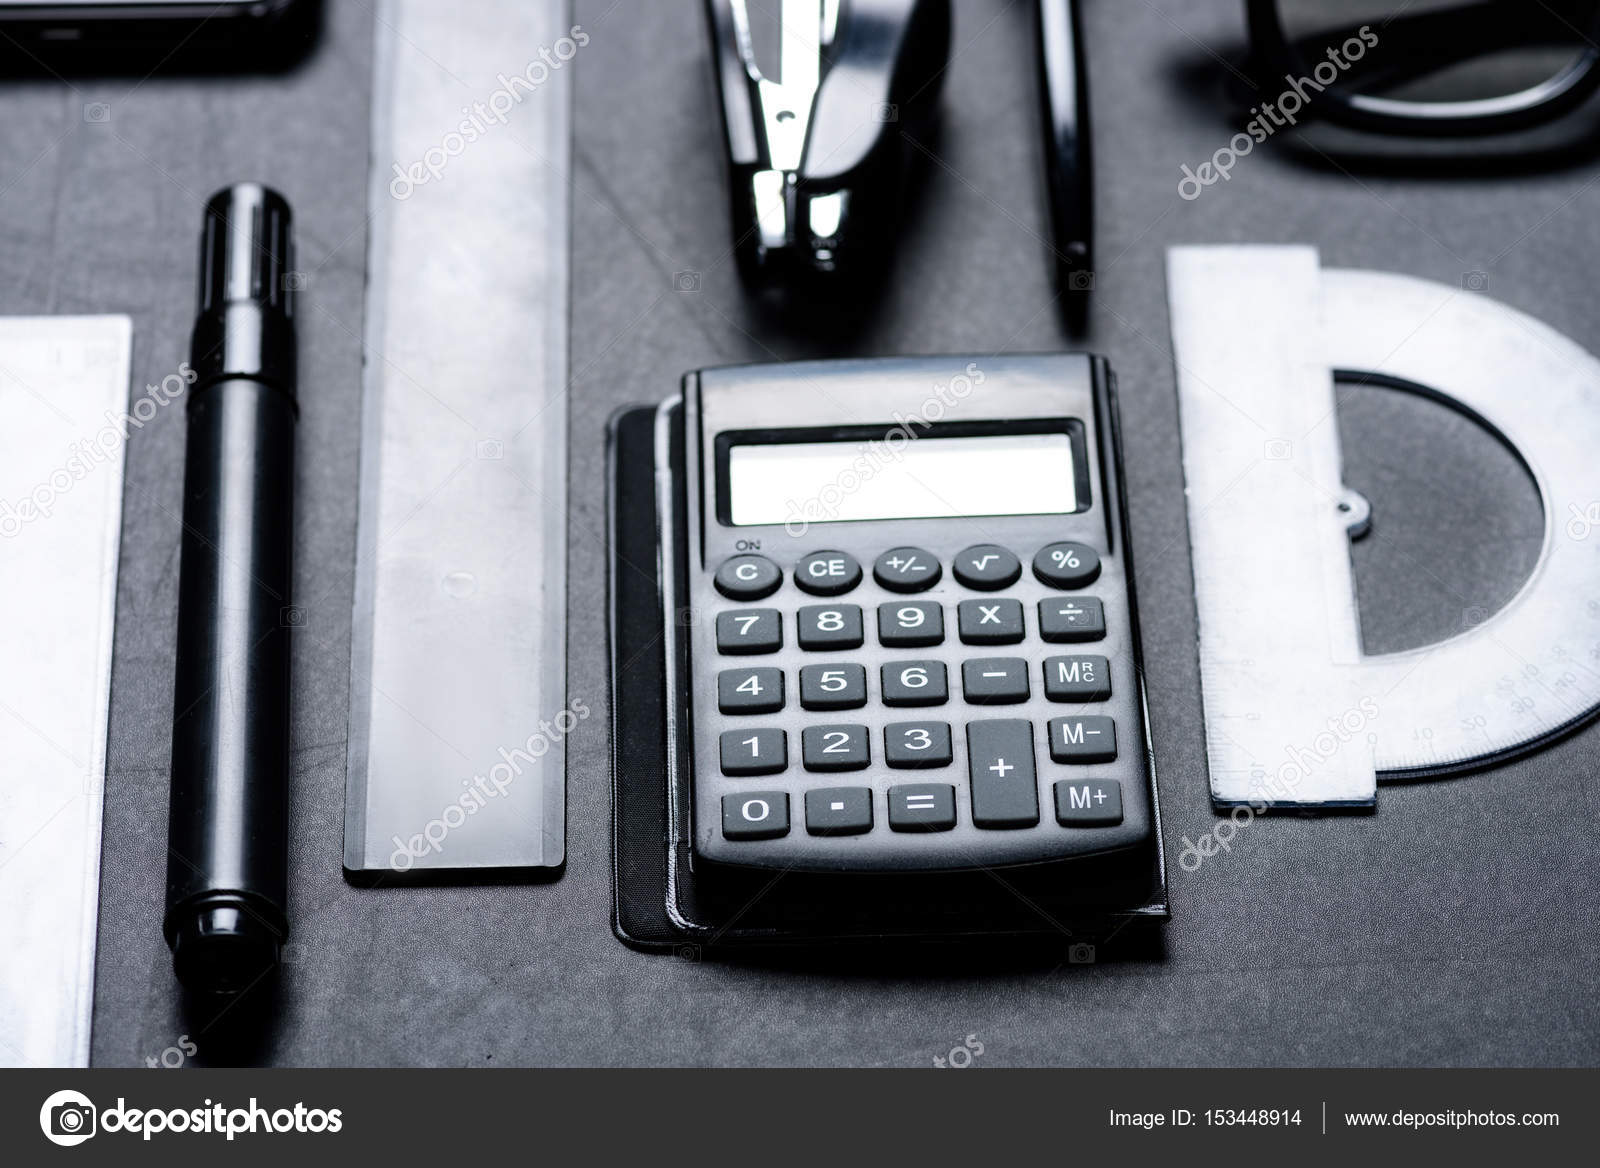 calculatrice avec divers ustensiles de bureau photographie arturverkhovetskiy 153448914. Black Bedroom Furniture Sets. Home Design Ideas